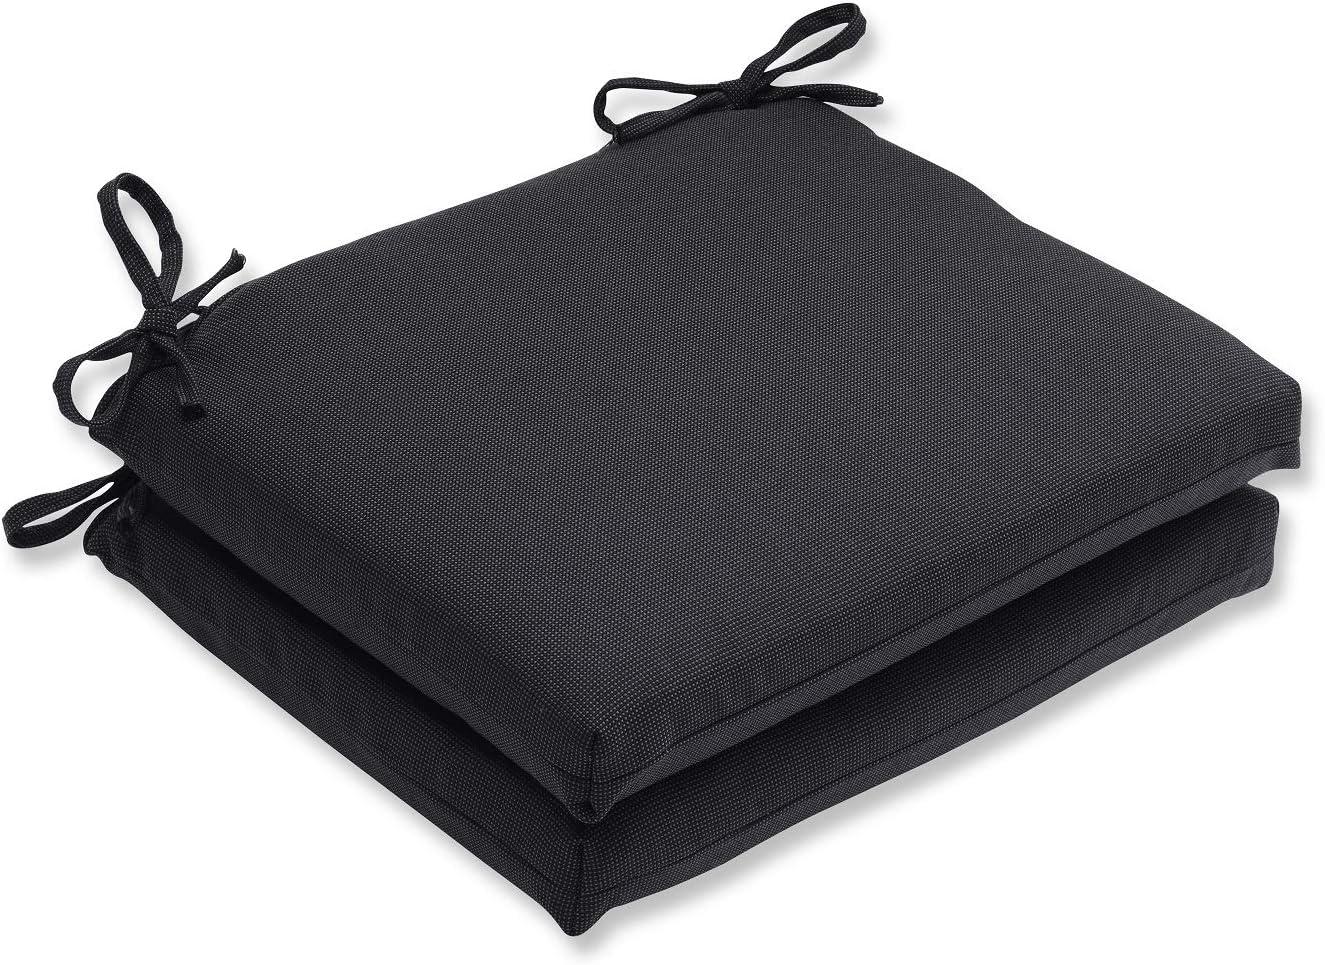 Black 8 Pack Seat Chair Cushion Outdoor Garden Tie On Waterproof Pad Zip Cover